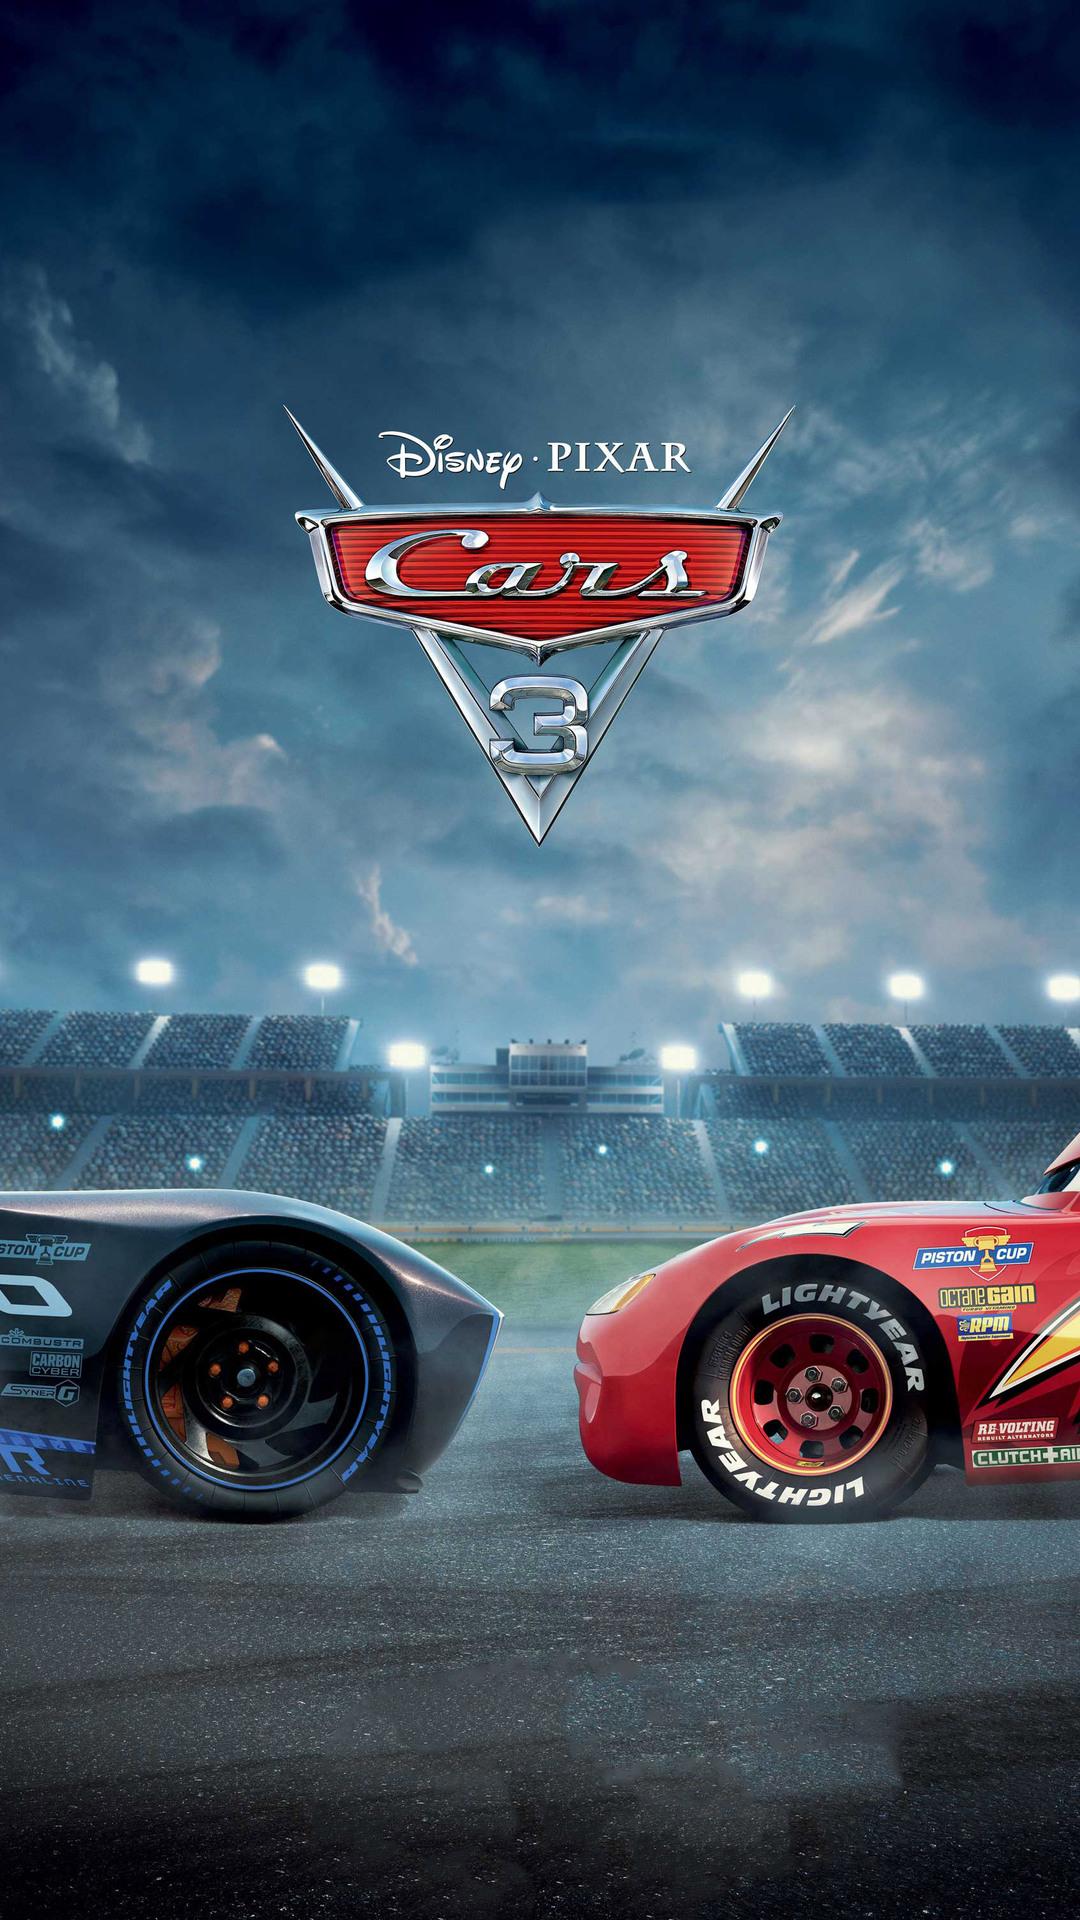 1080x1920 Cars 3 Pixar Animated Movie Iphone 7 6s 6 Plus